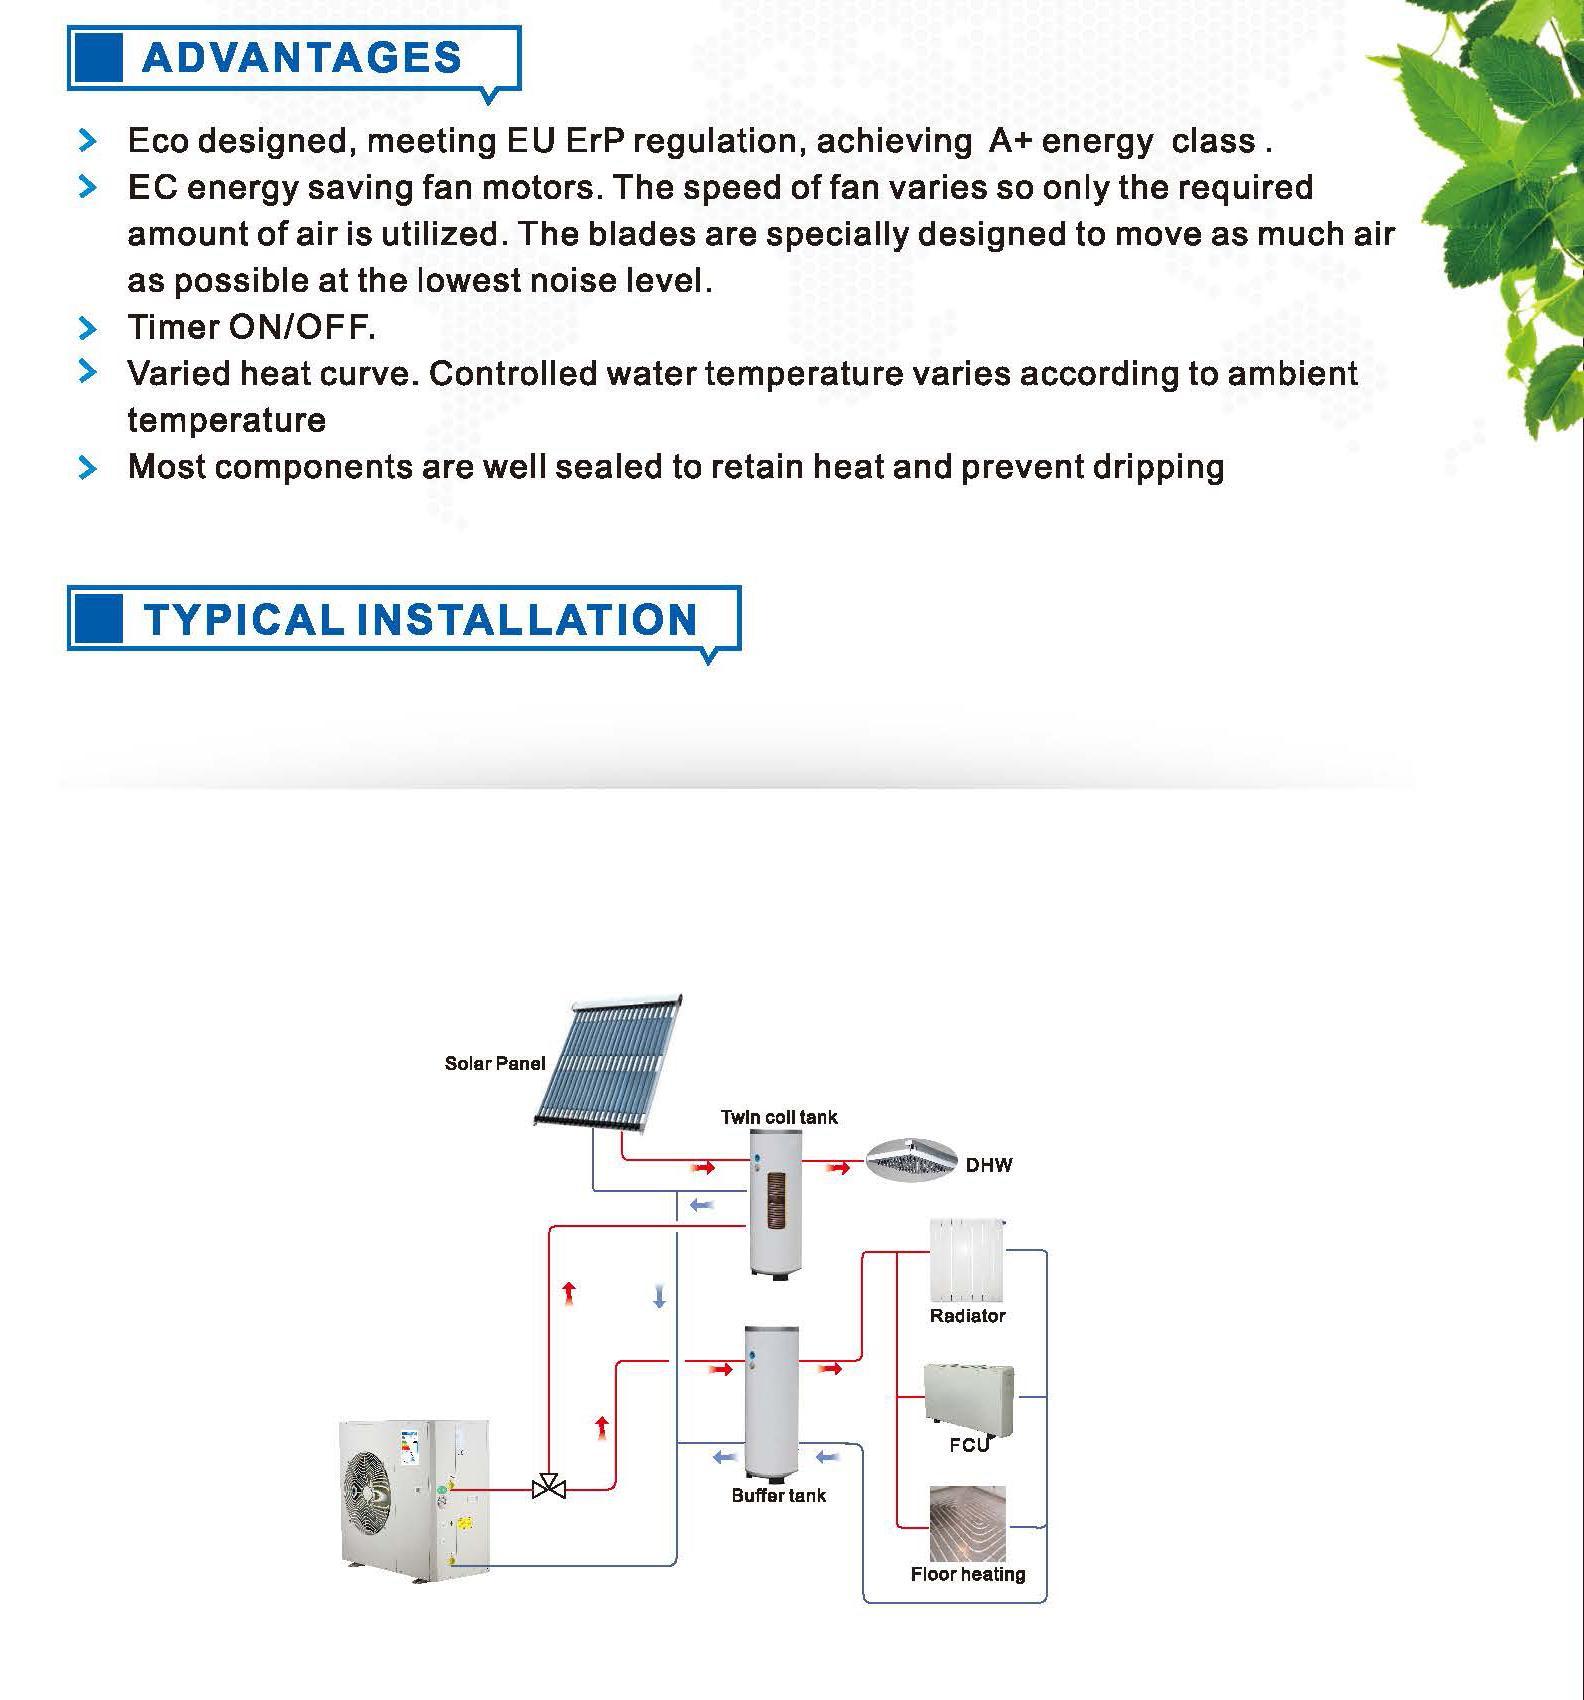 hiseer heat pump advantage